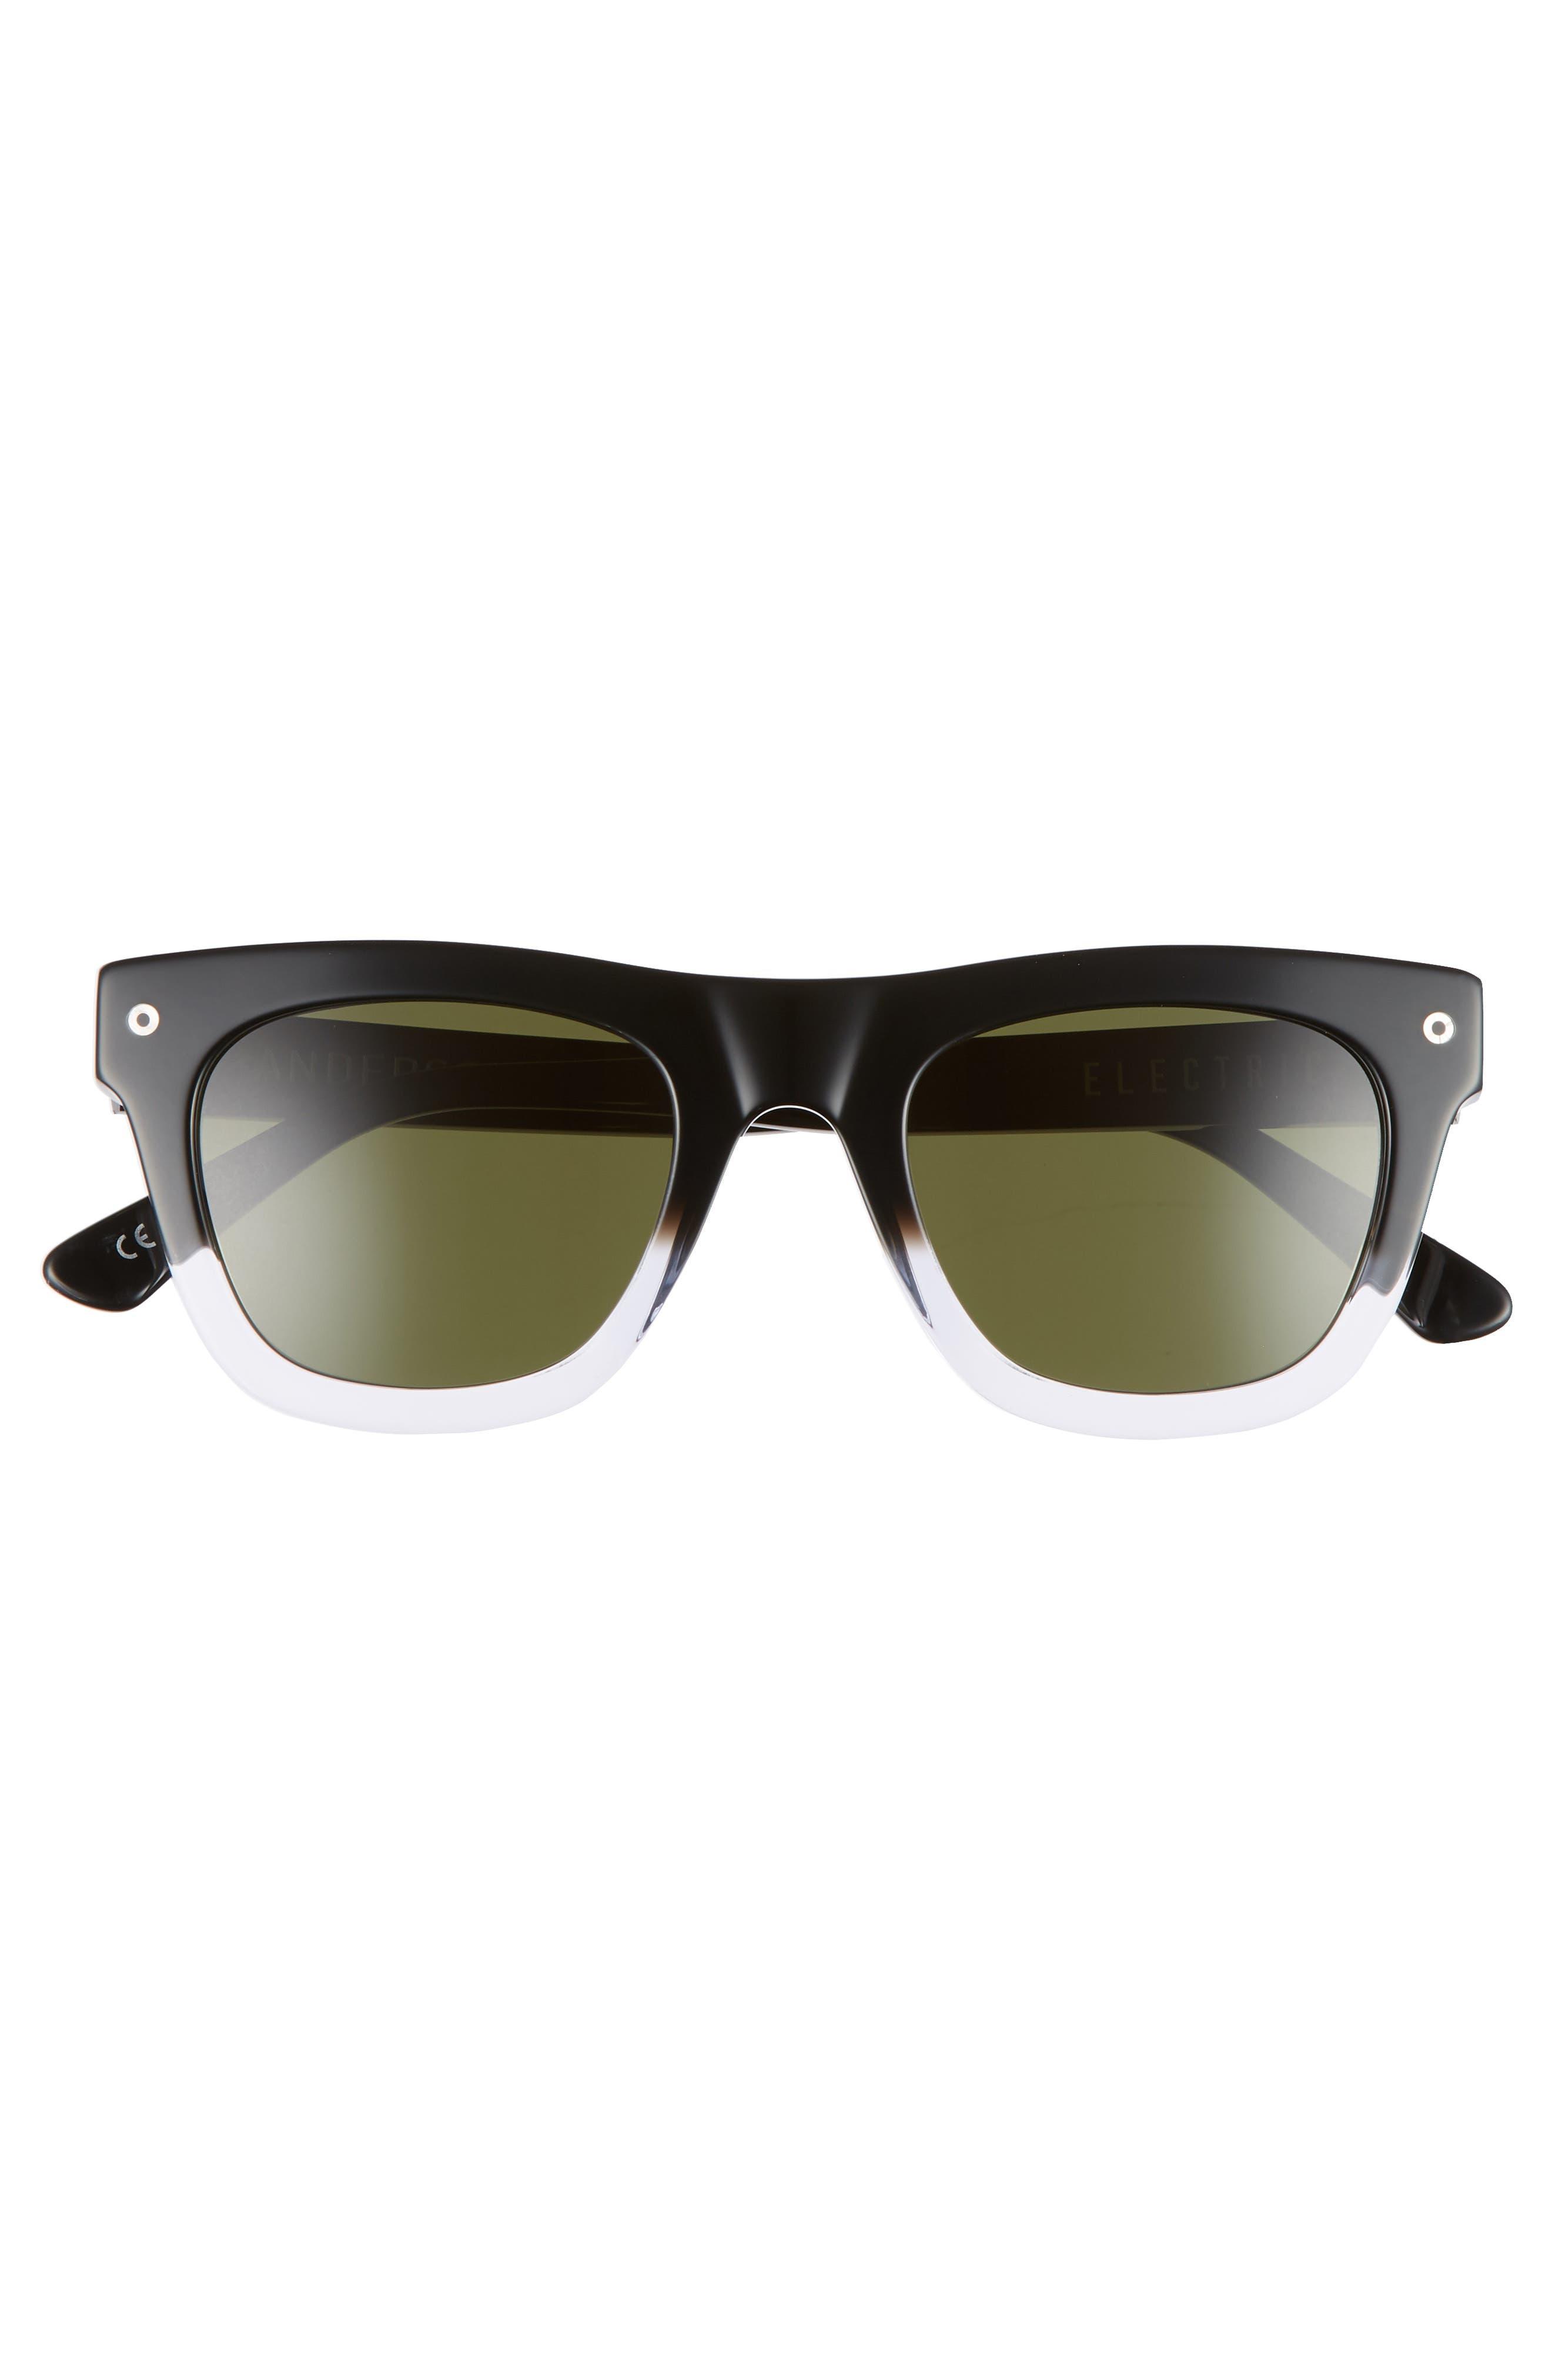 Andersen 49mm Sunglasses,                             Alternate thumbnail 3, color,                             BLACK CLEAR FADE/ GREY